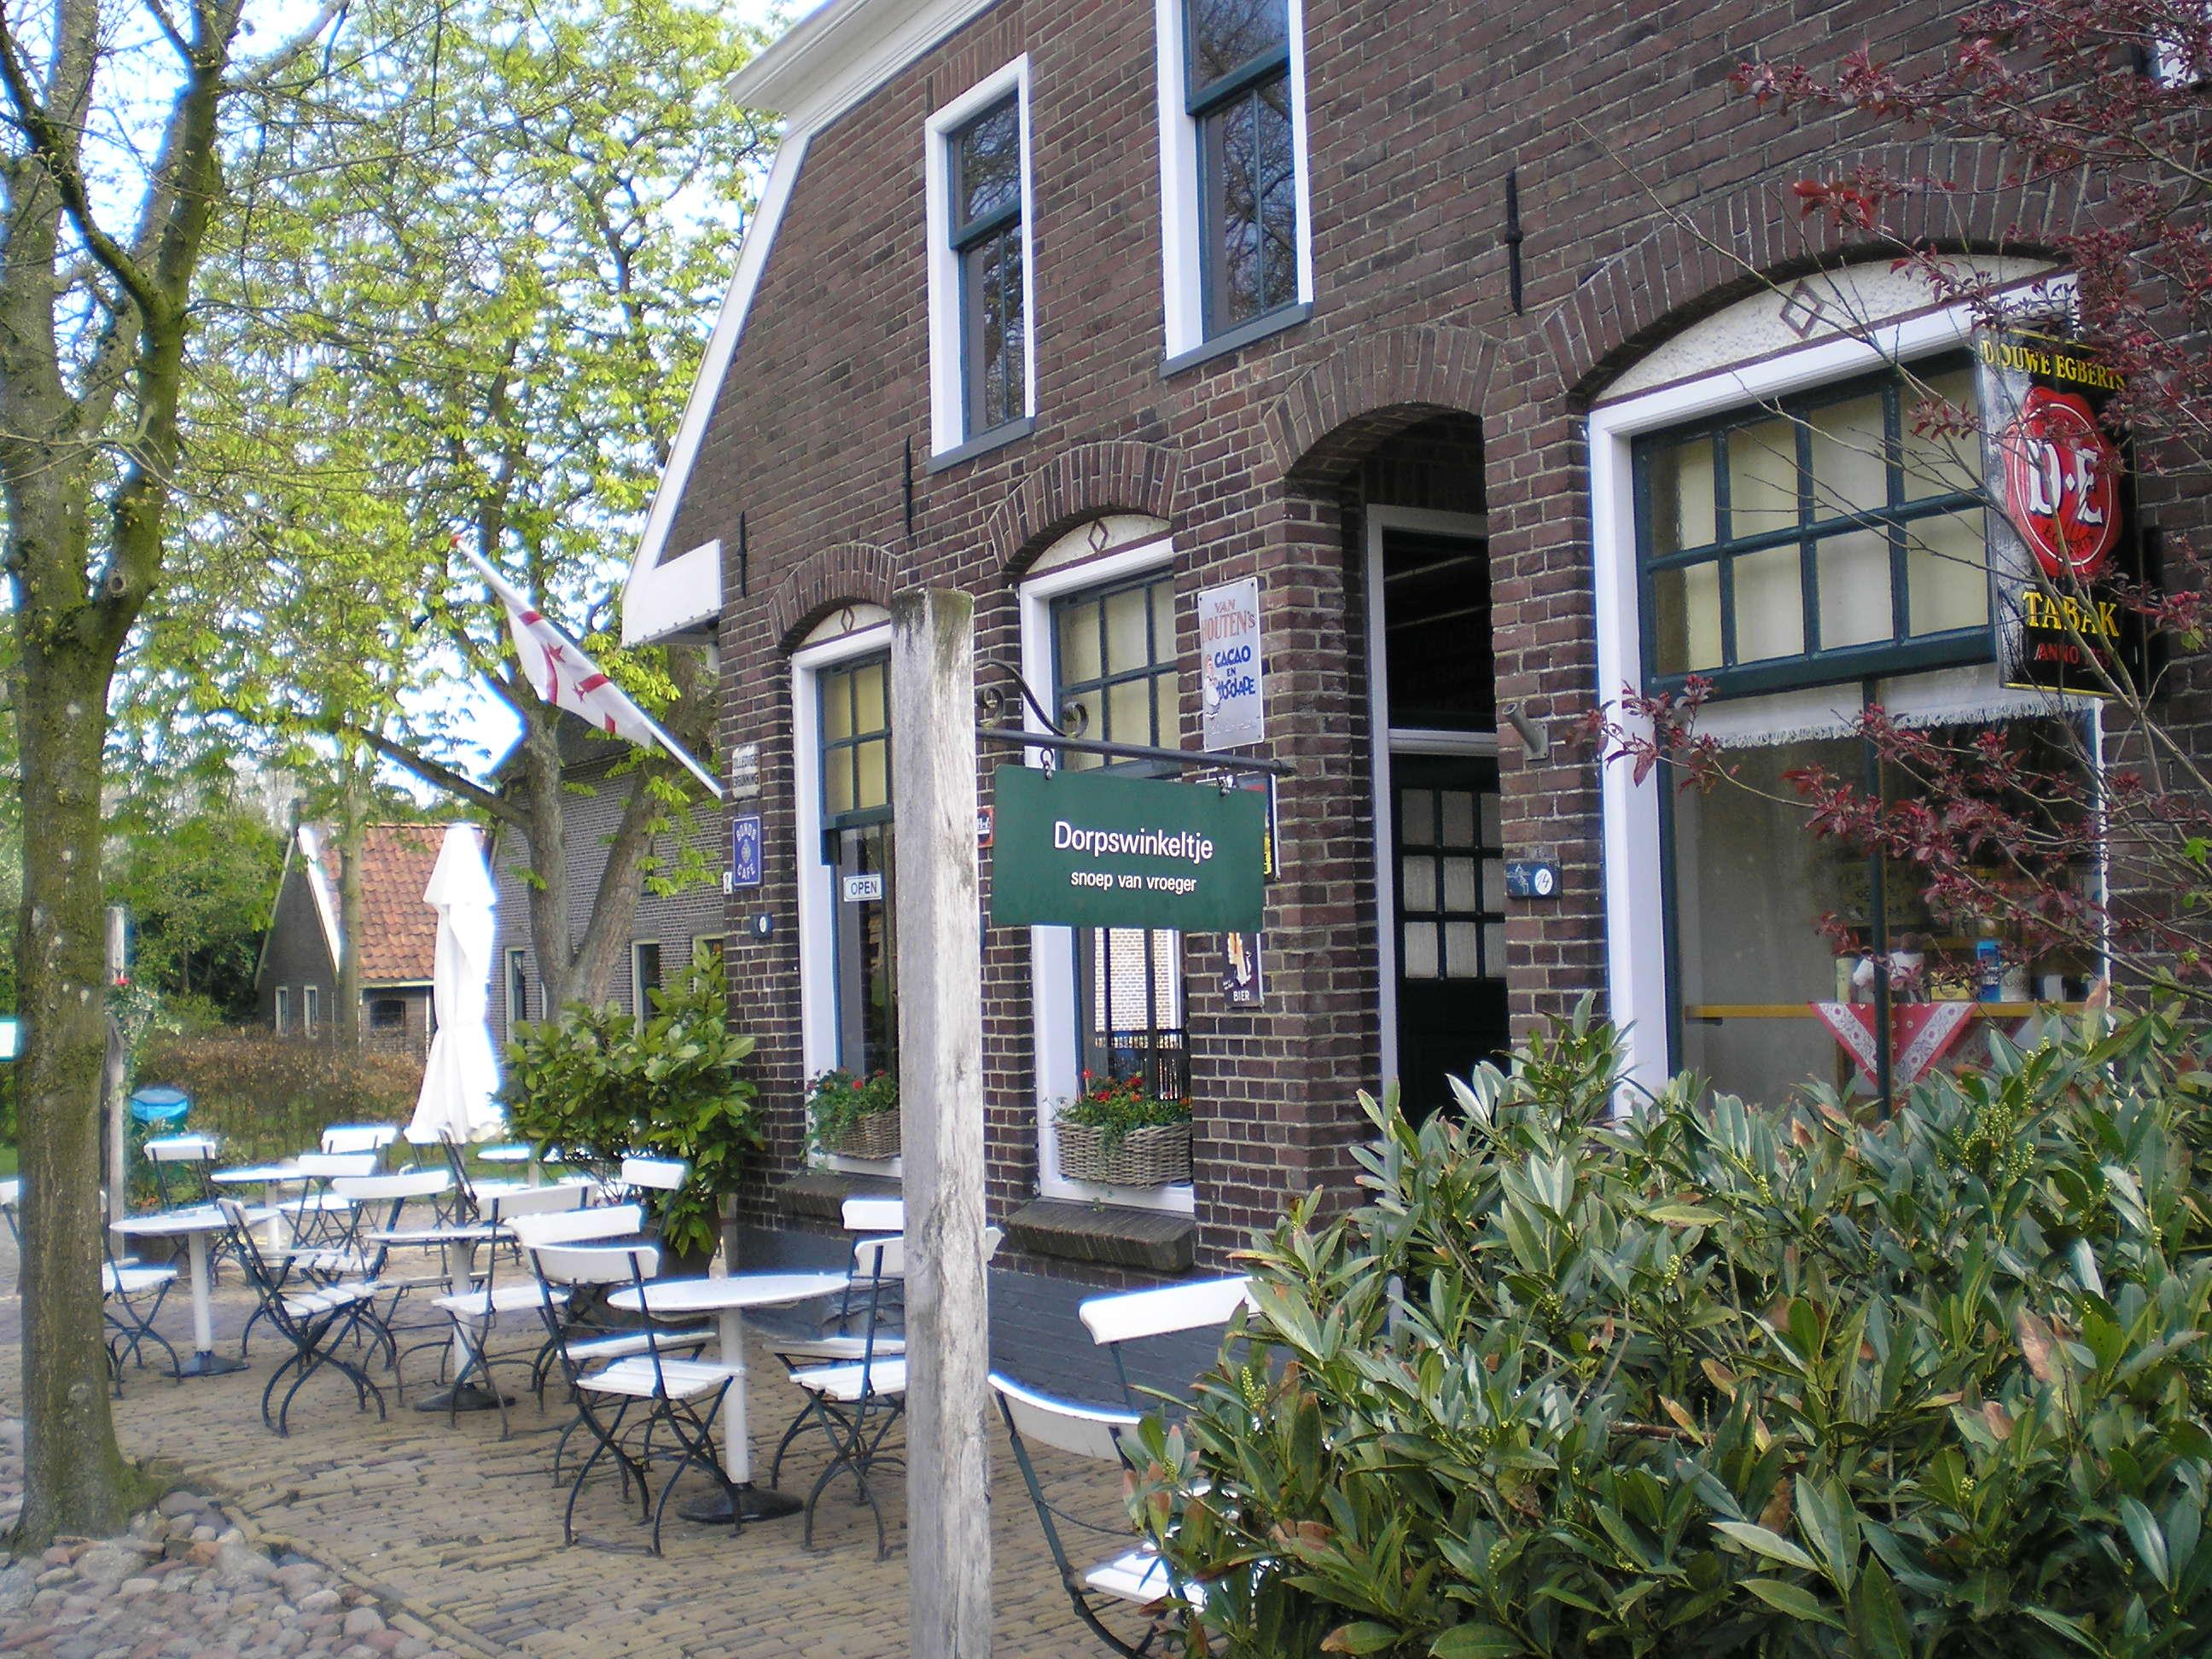 File:Dorpswinkeltje Schoolstraat-1 Orvelte Drenthe Nederland.JPG